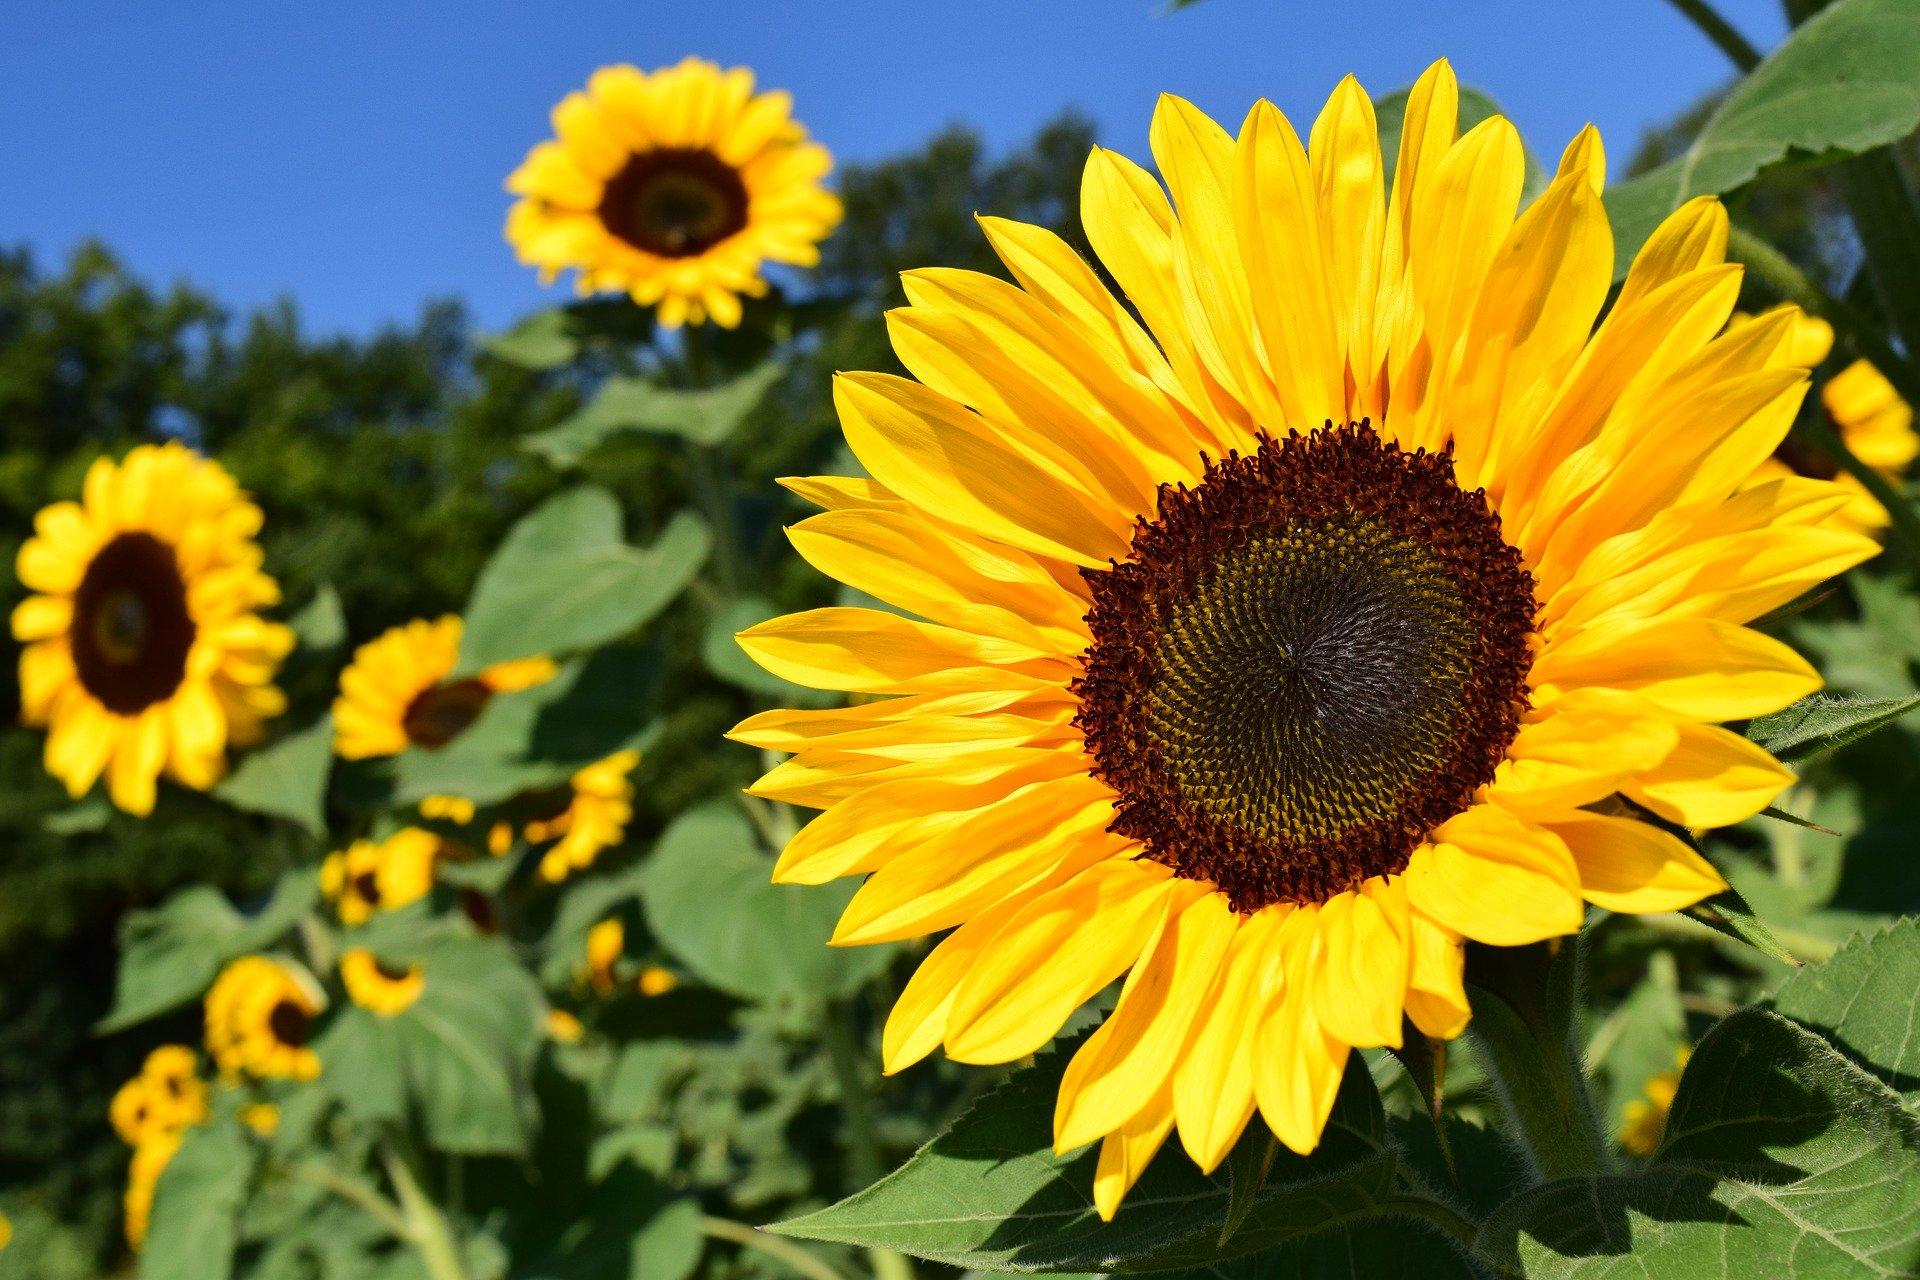 sunflower-1627193_1920